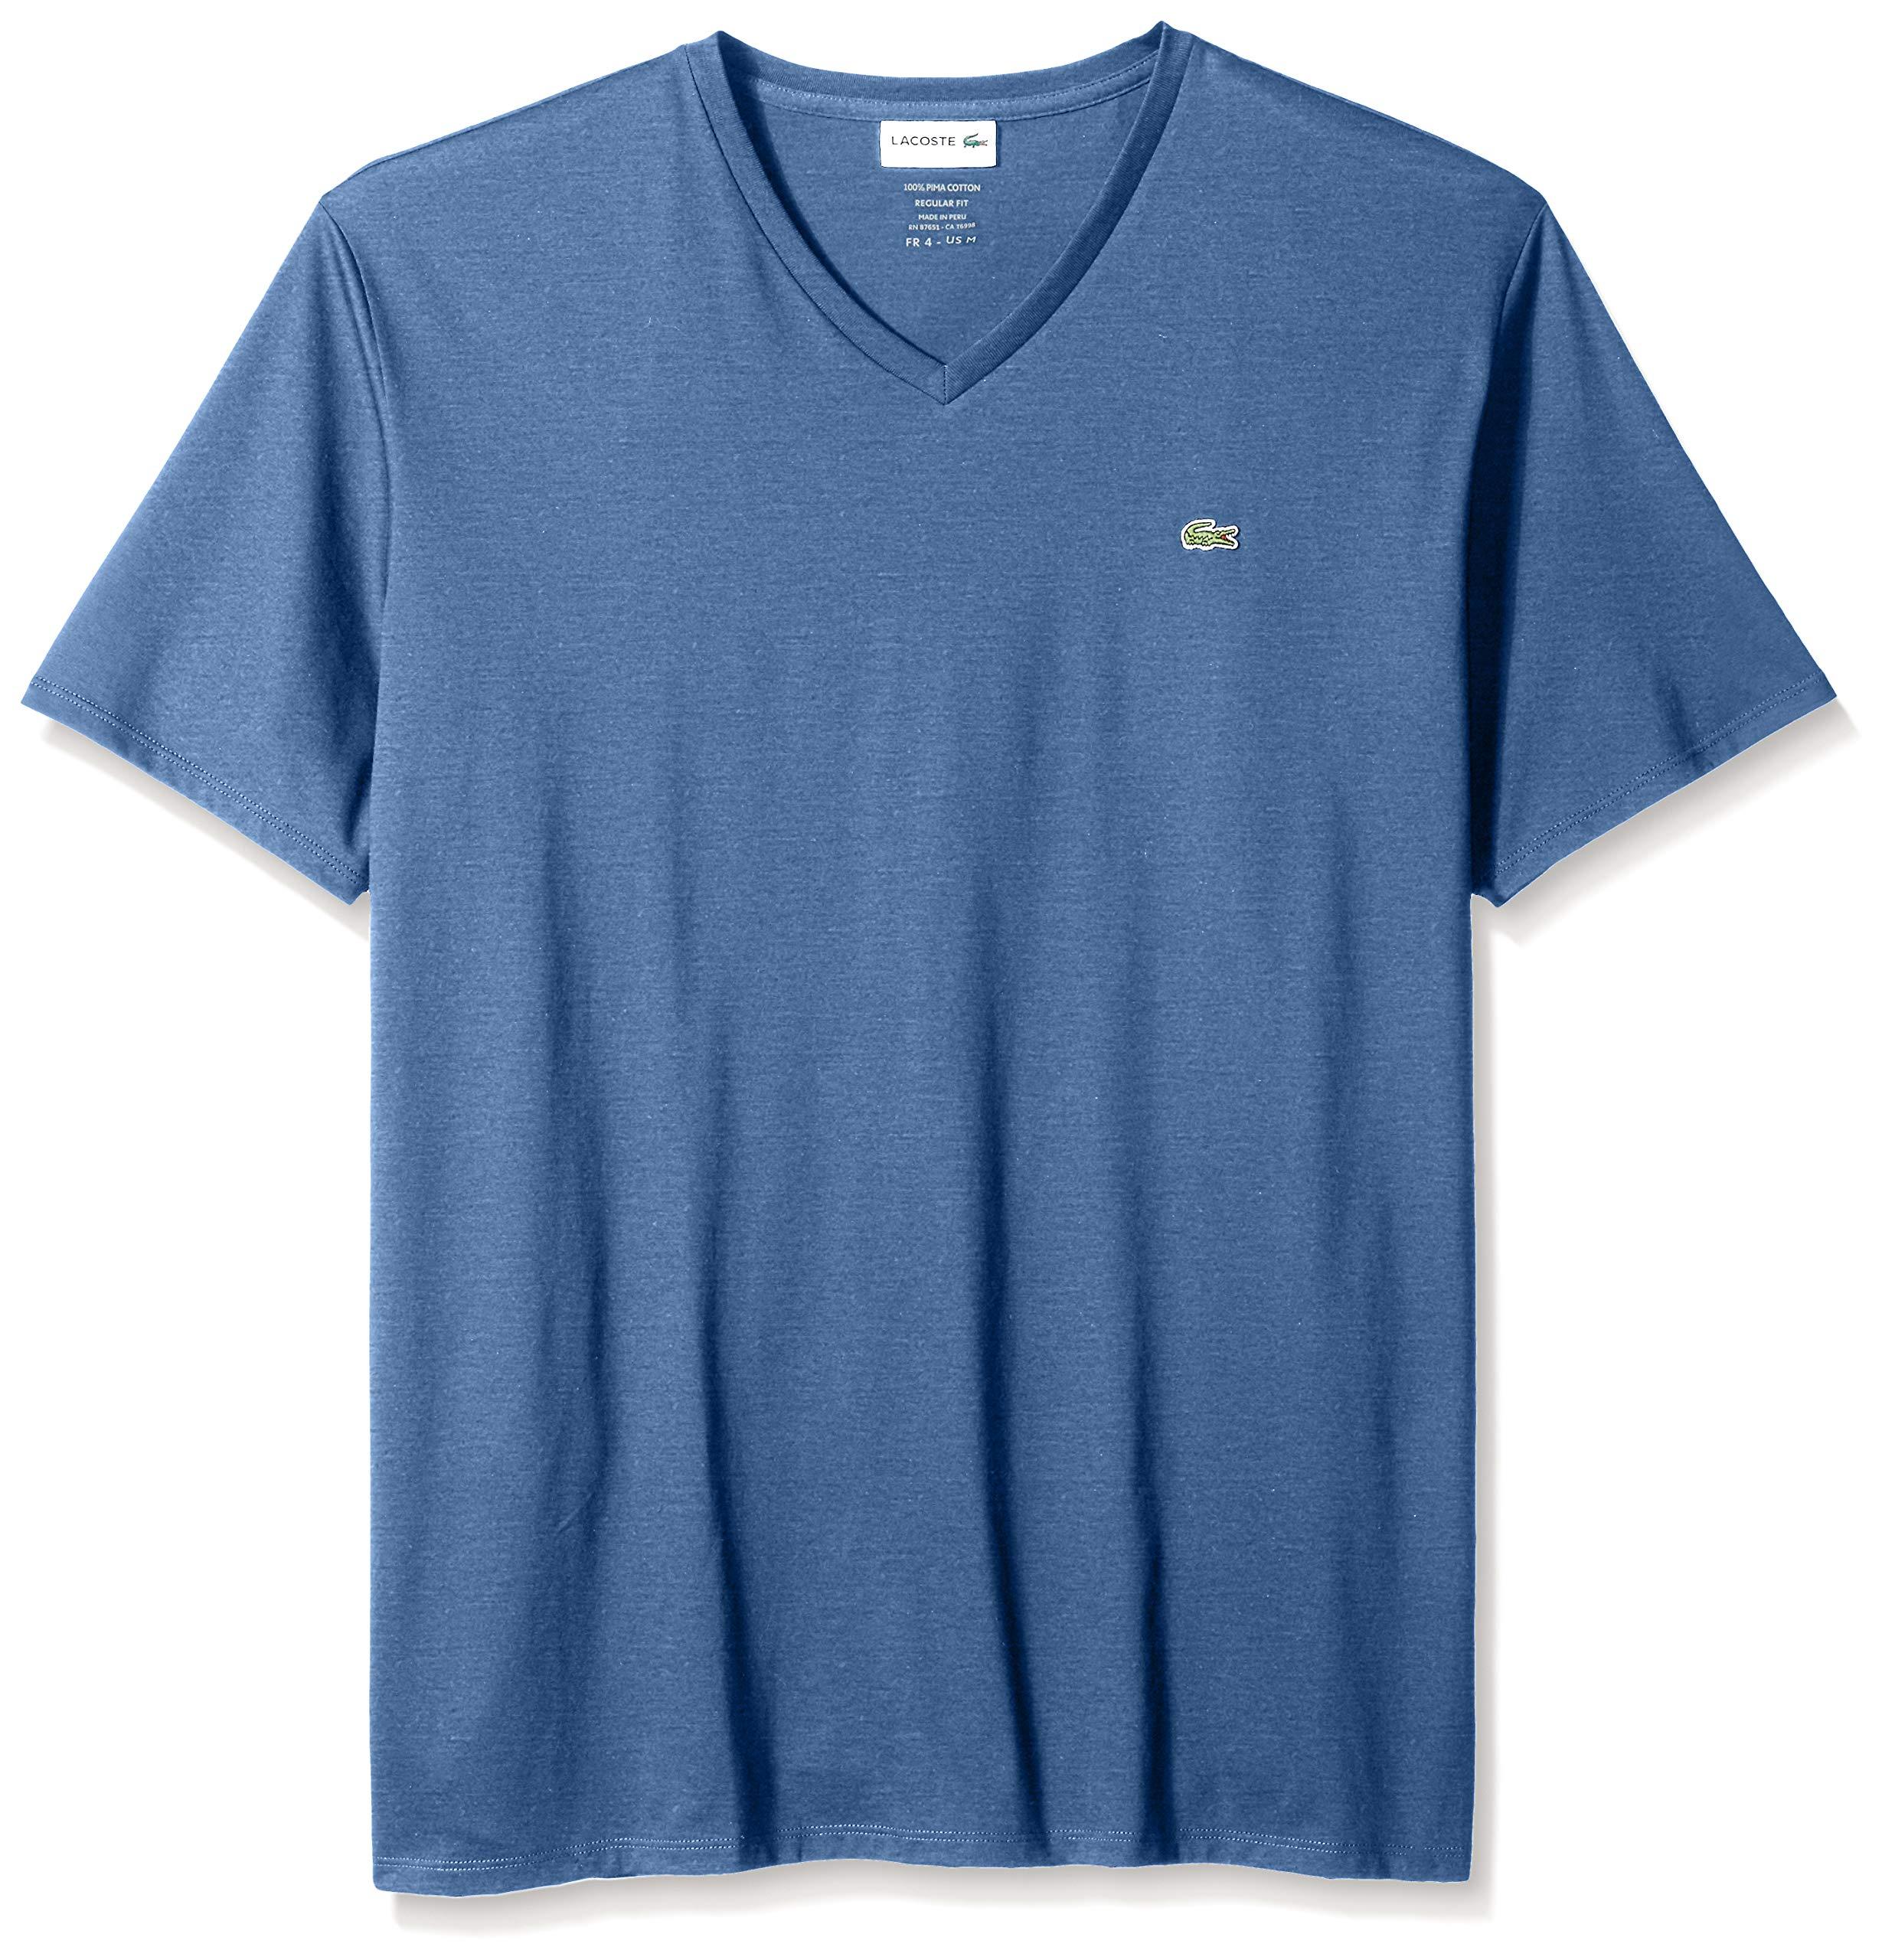 Lacoste Men's Short Sleeve V-Neck Pima Cotton Jersey T-Shirt, Alby Chine, M